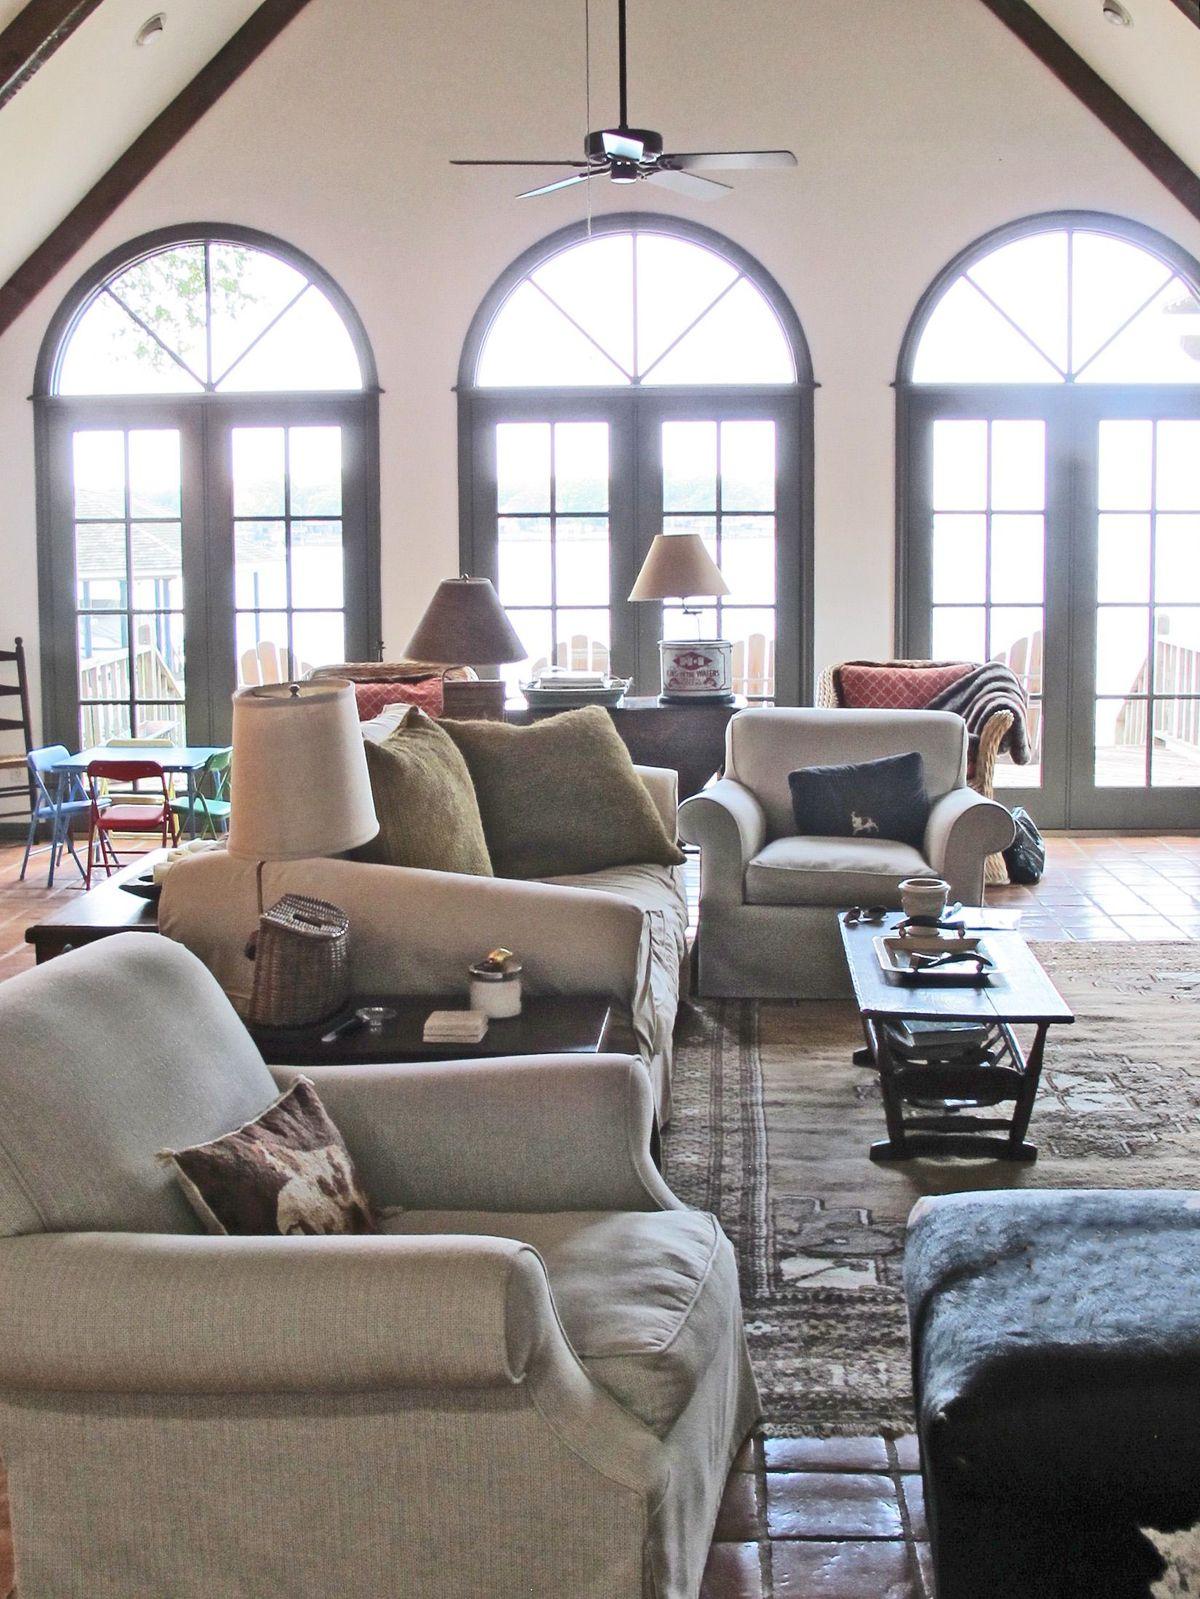 Montana Lakehouse Video Shoot Location Homes Dallas 7.jpg